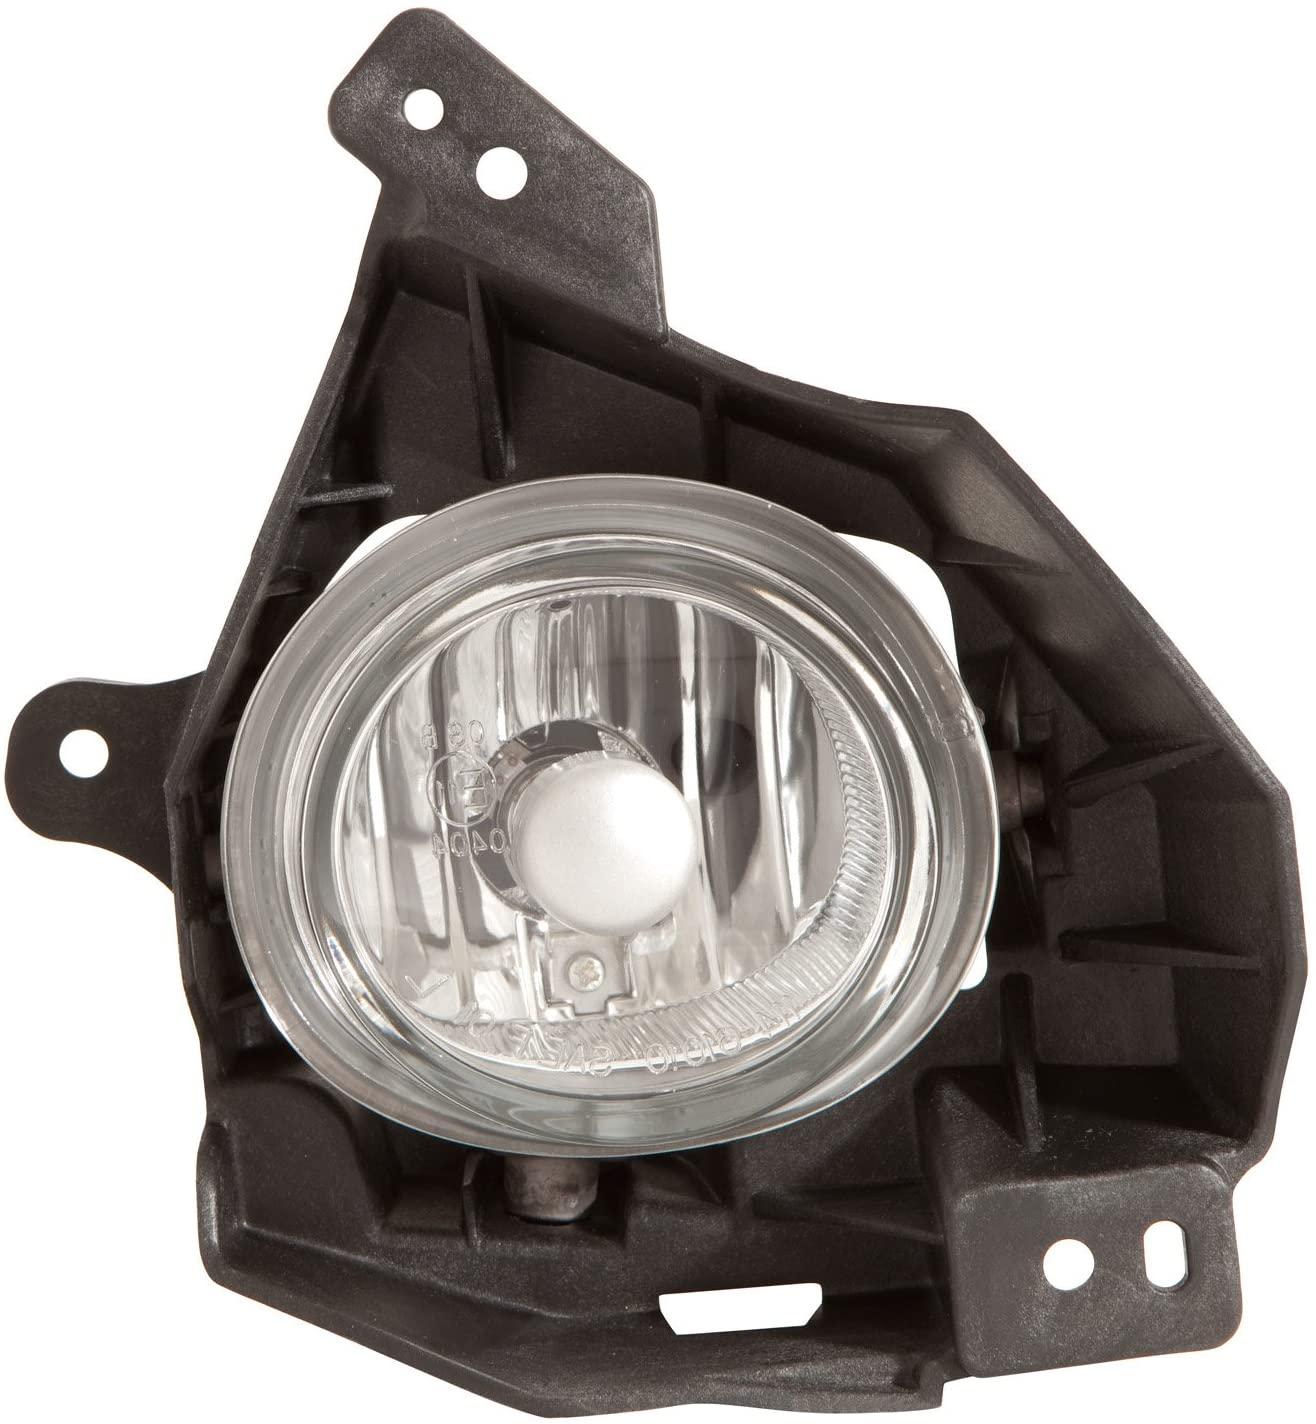 ACK Automotive Mazda 2 Fog Light Assembly Replaces Oem: 92246245 Passenger Side